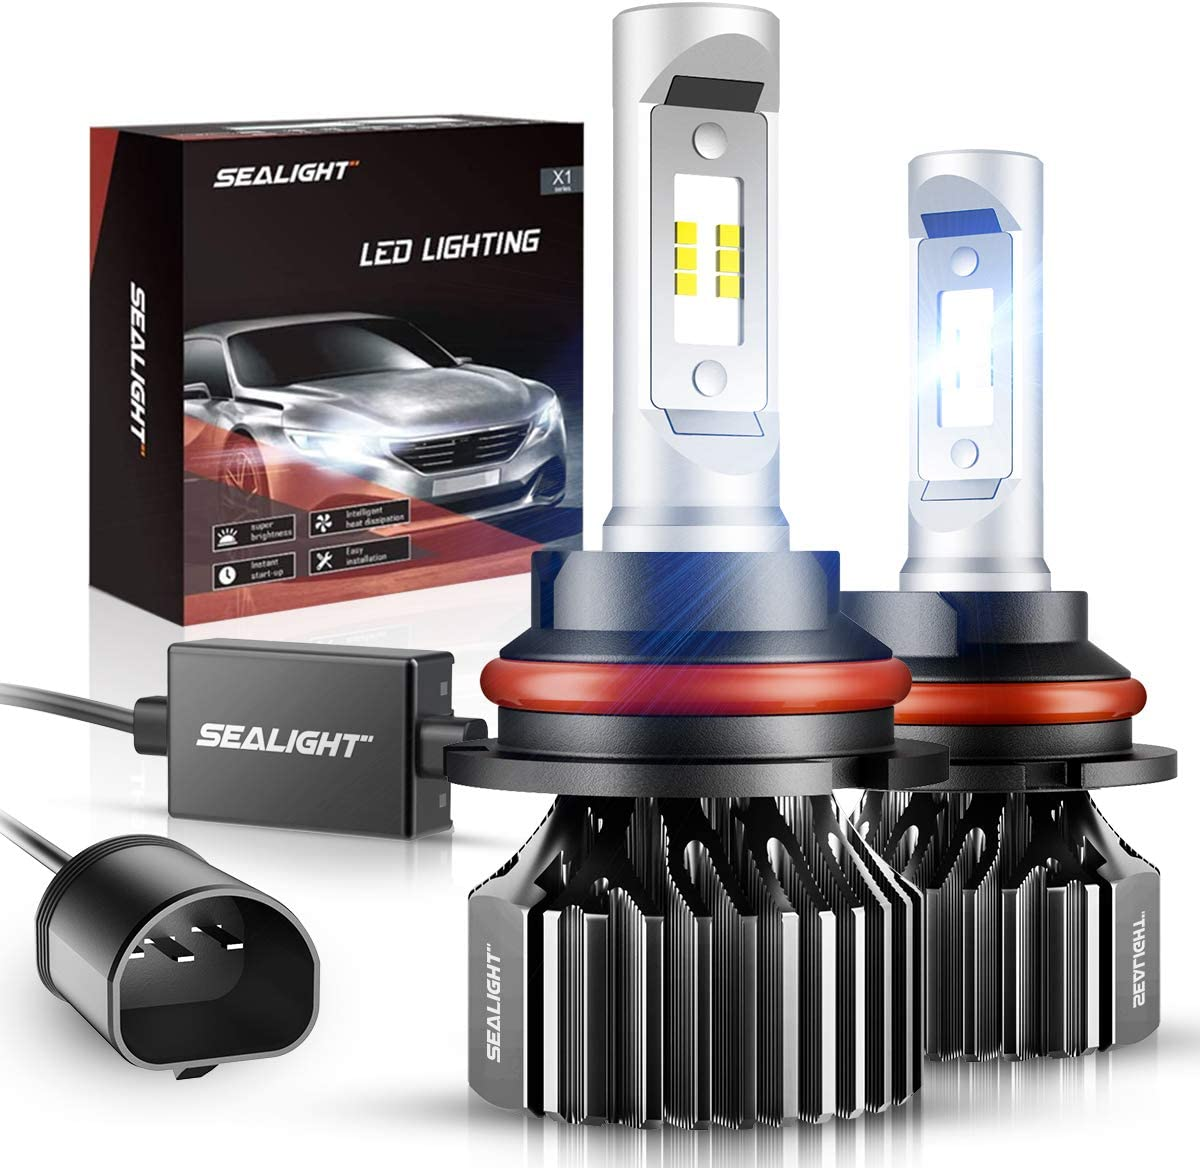 SEALIGHT 9007, HB5 LED Headlight Bulbs